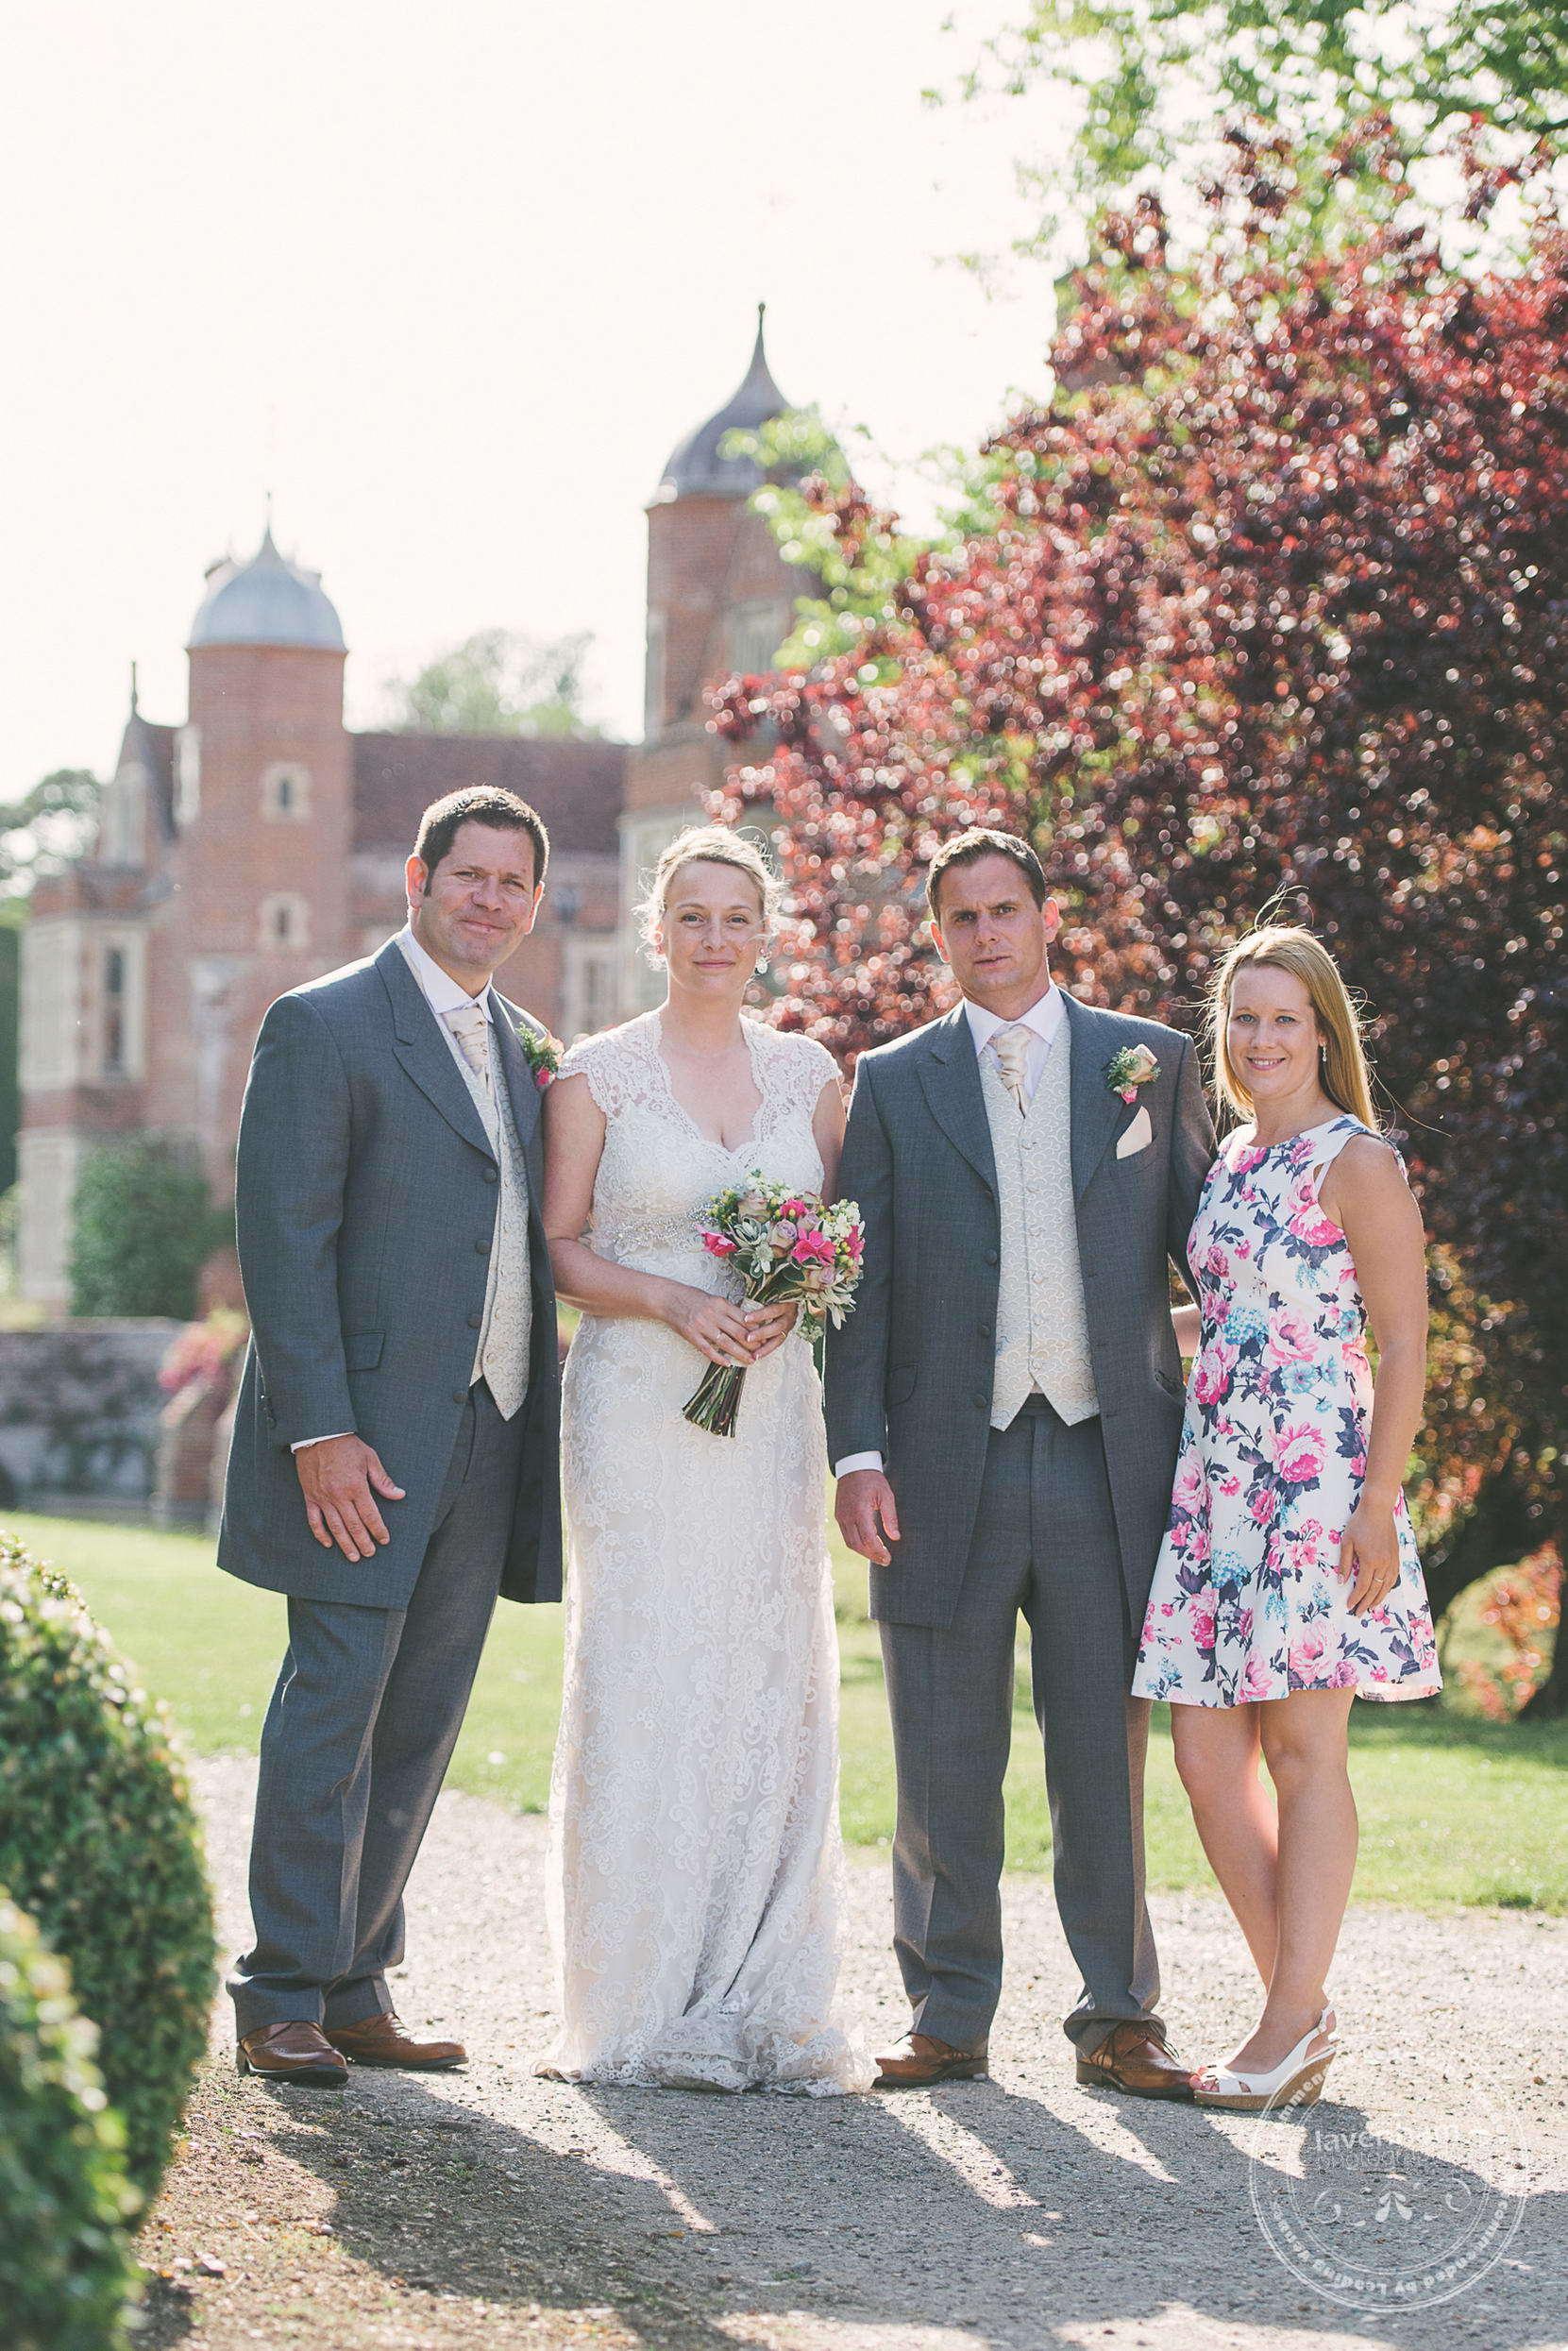 180715-kentwell-hall-wedding-photographer-041